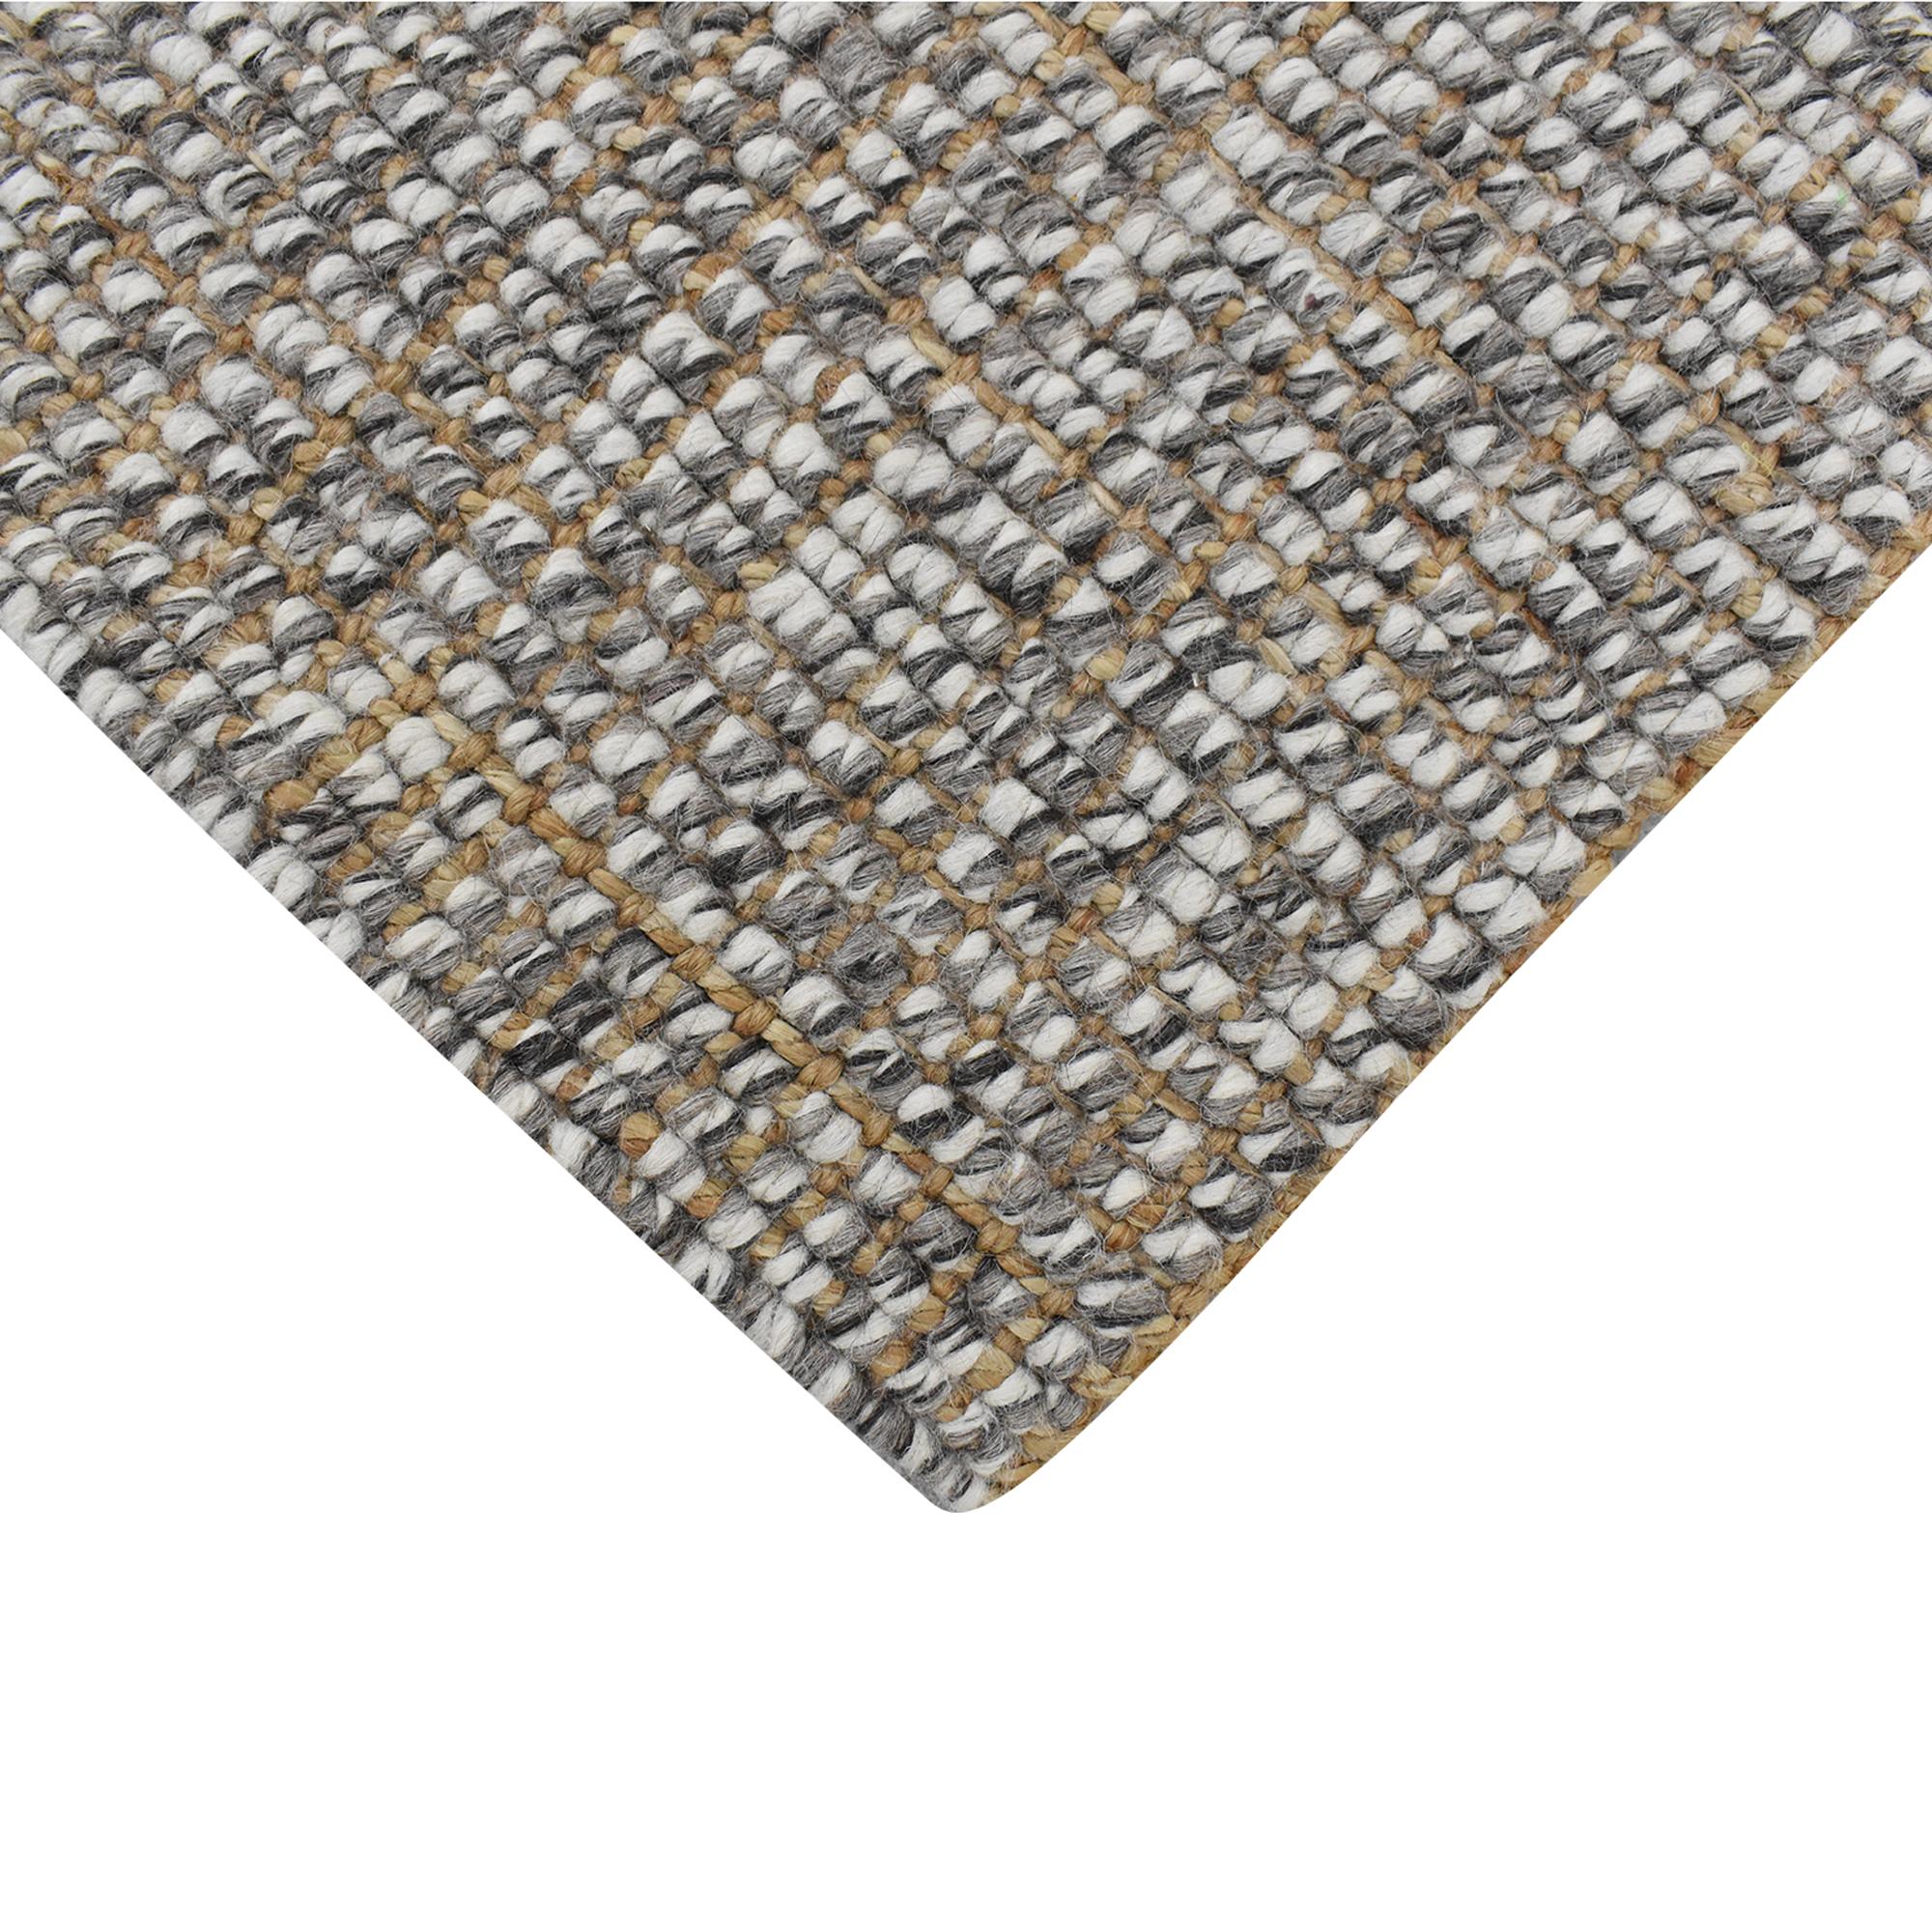 Pottery Barn Chunky Wool Jute Rug 5x8 sale